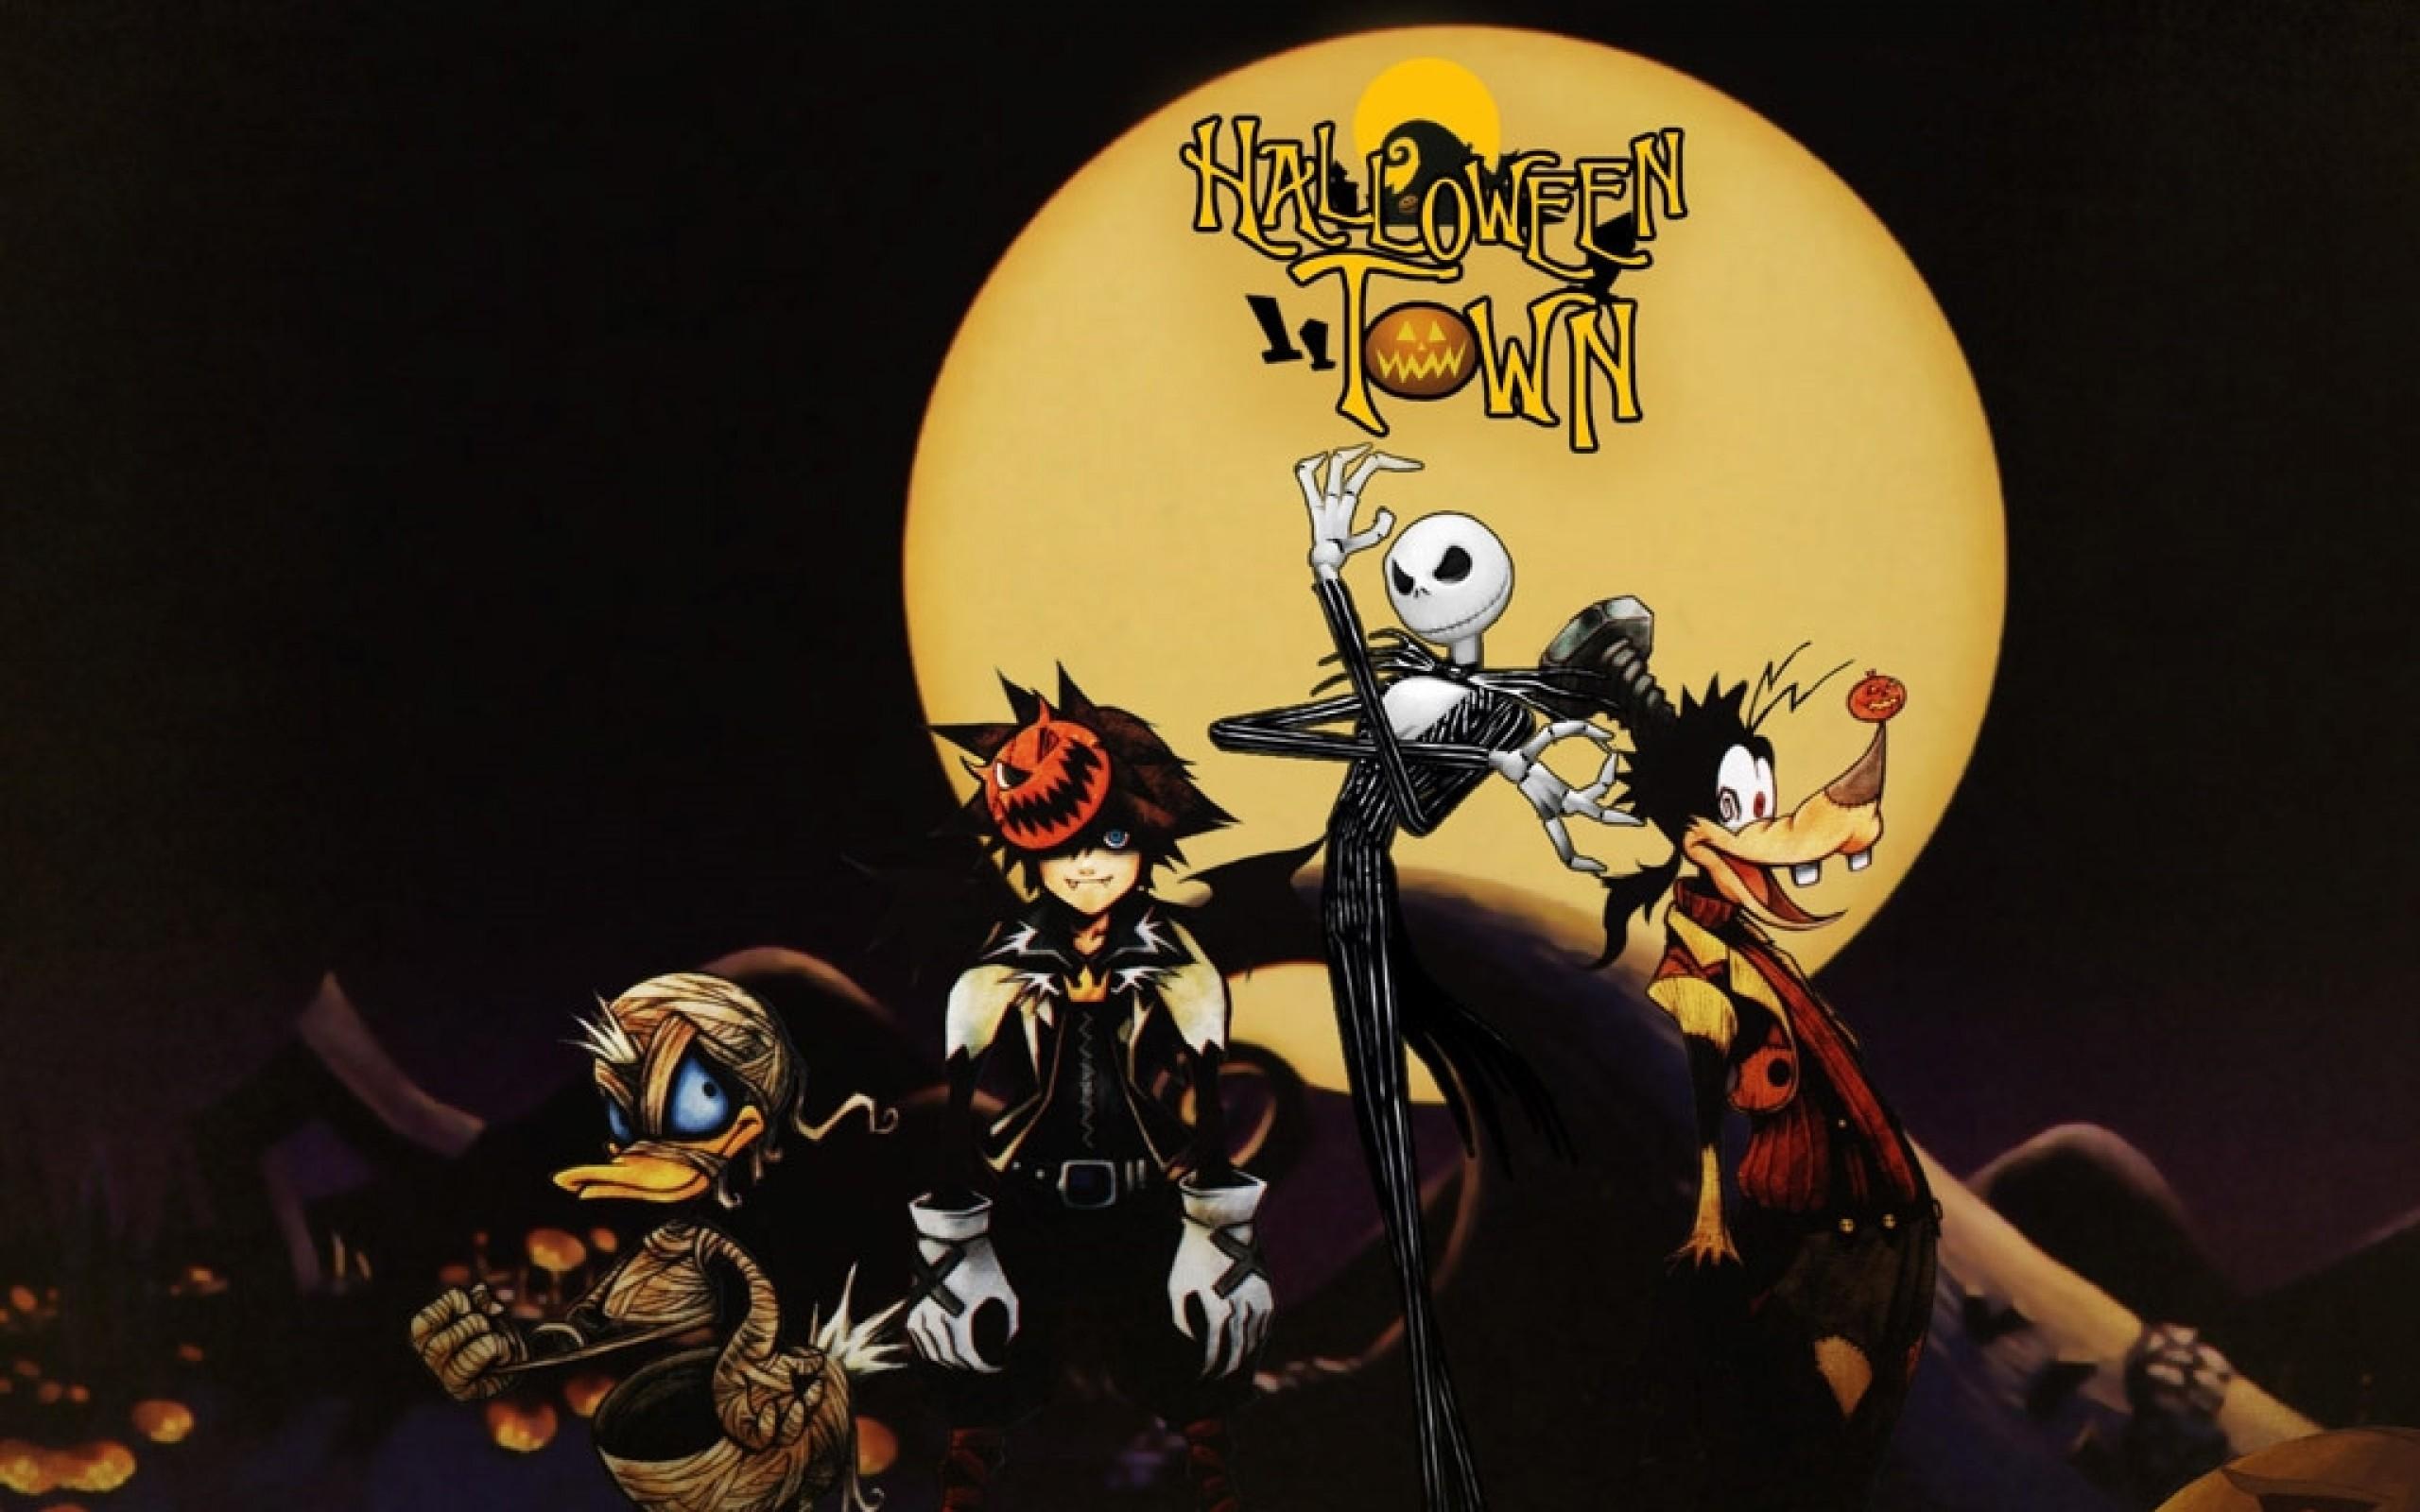 kingdom hearts halloween goofy jack skellington the nightmare before  christmas donald duck sora 1 Wallpaper HD